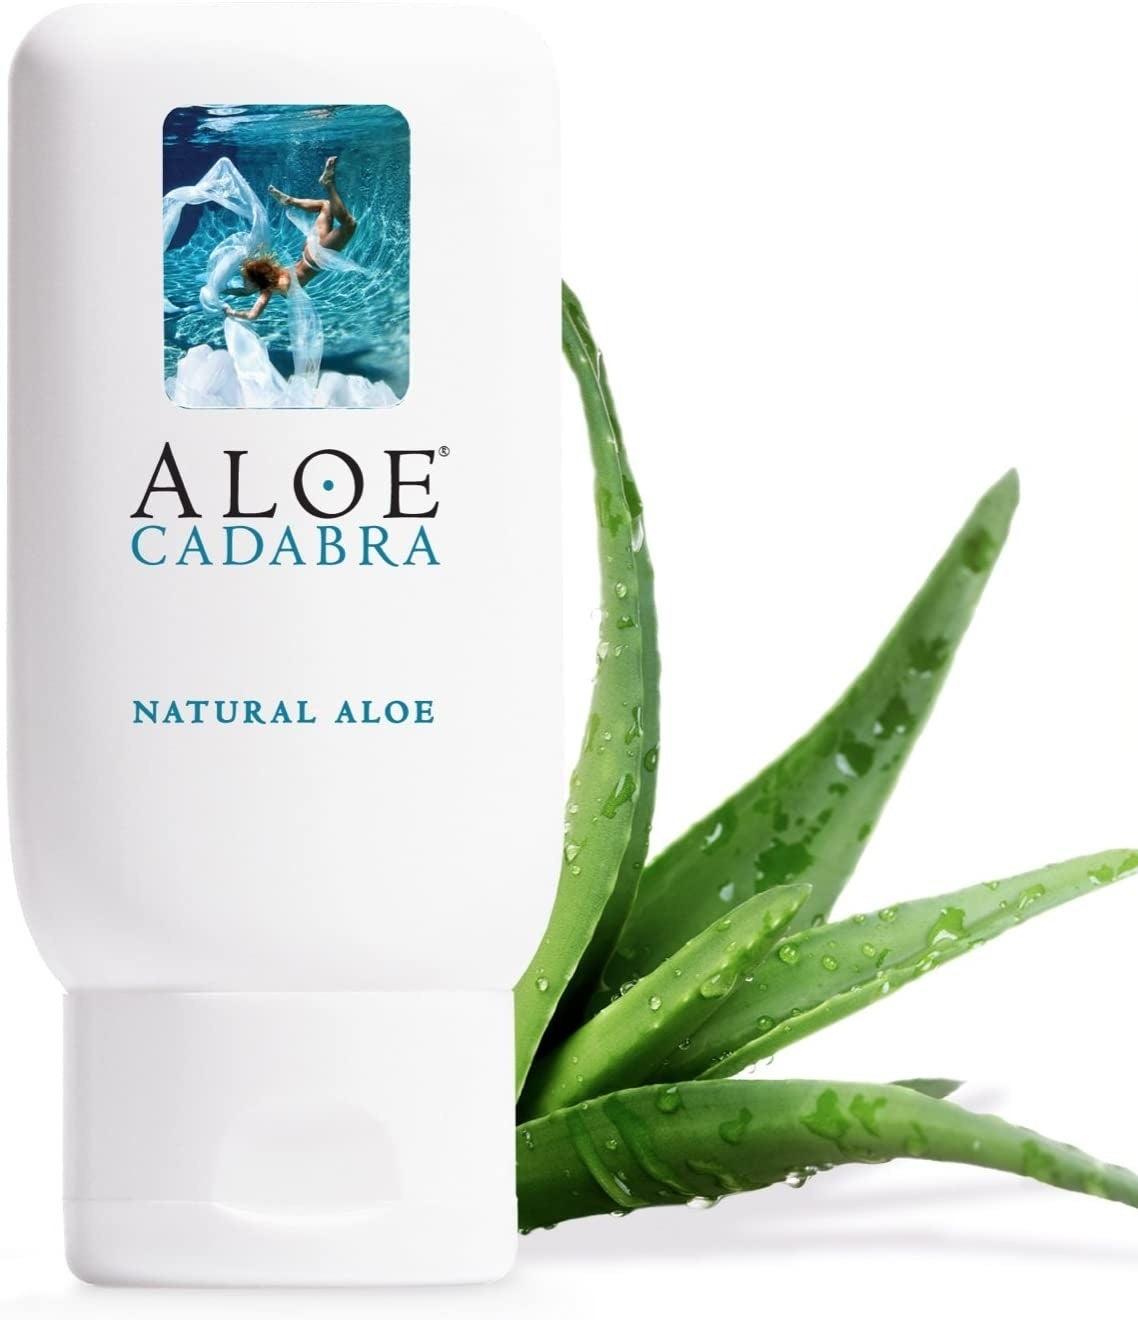 Bottle of Aloe Cadabra lubricant next to aloe plant